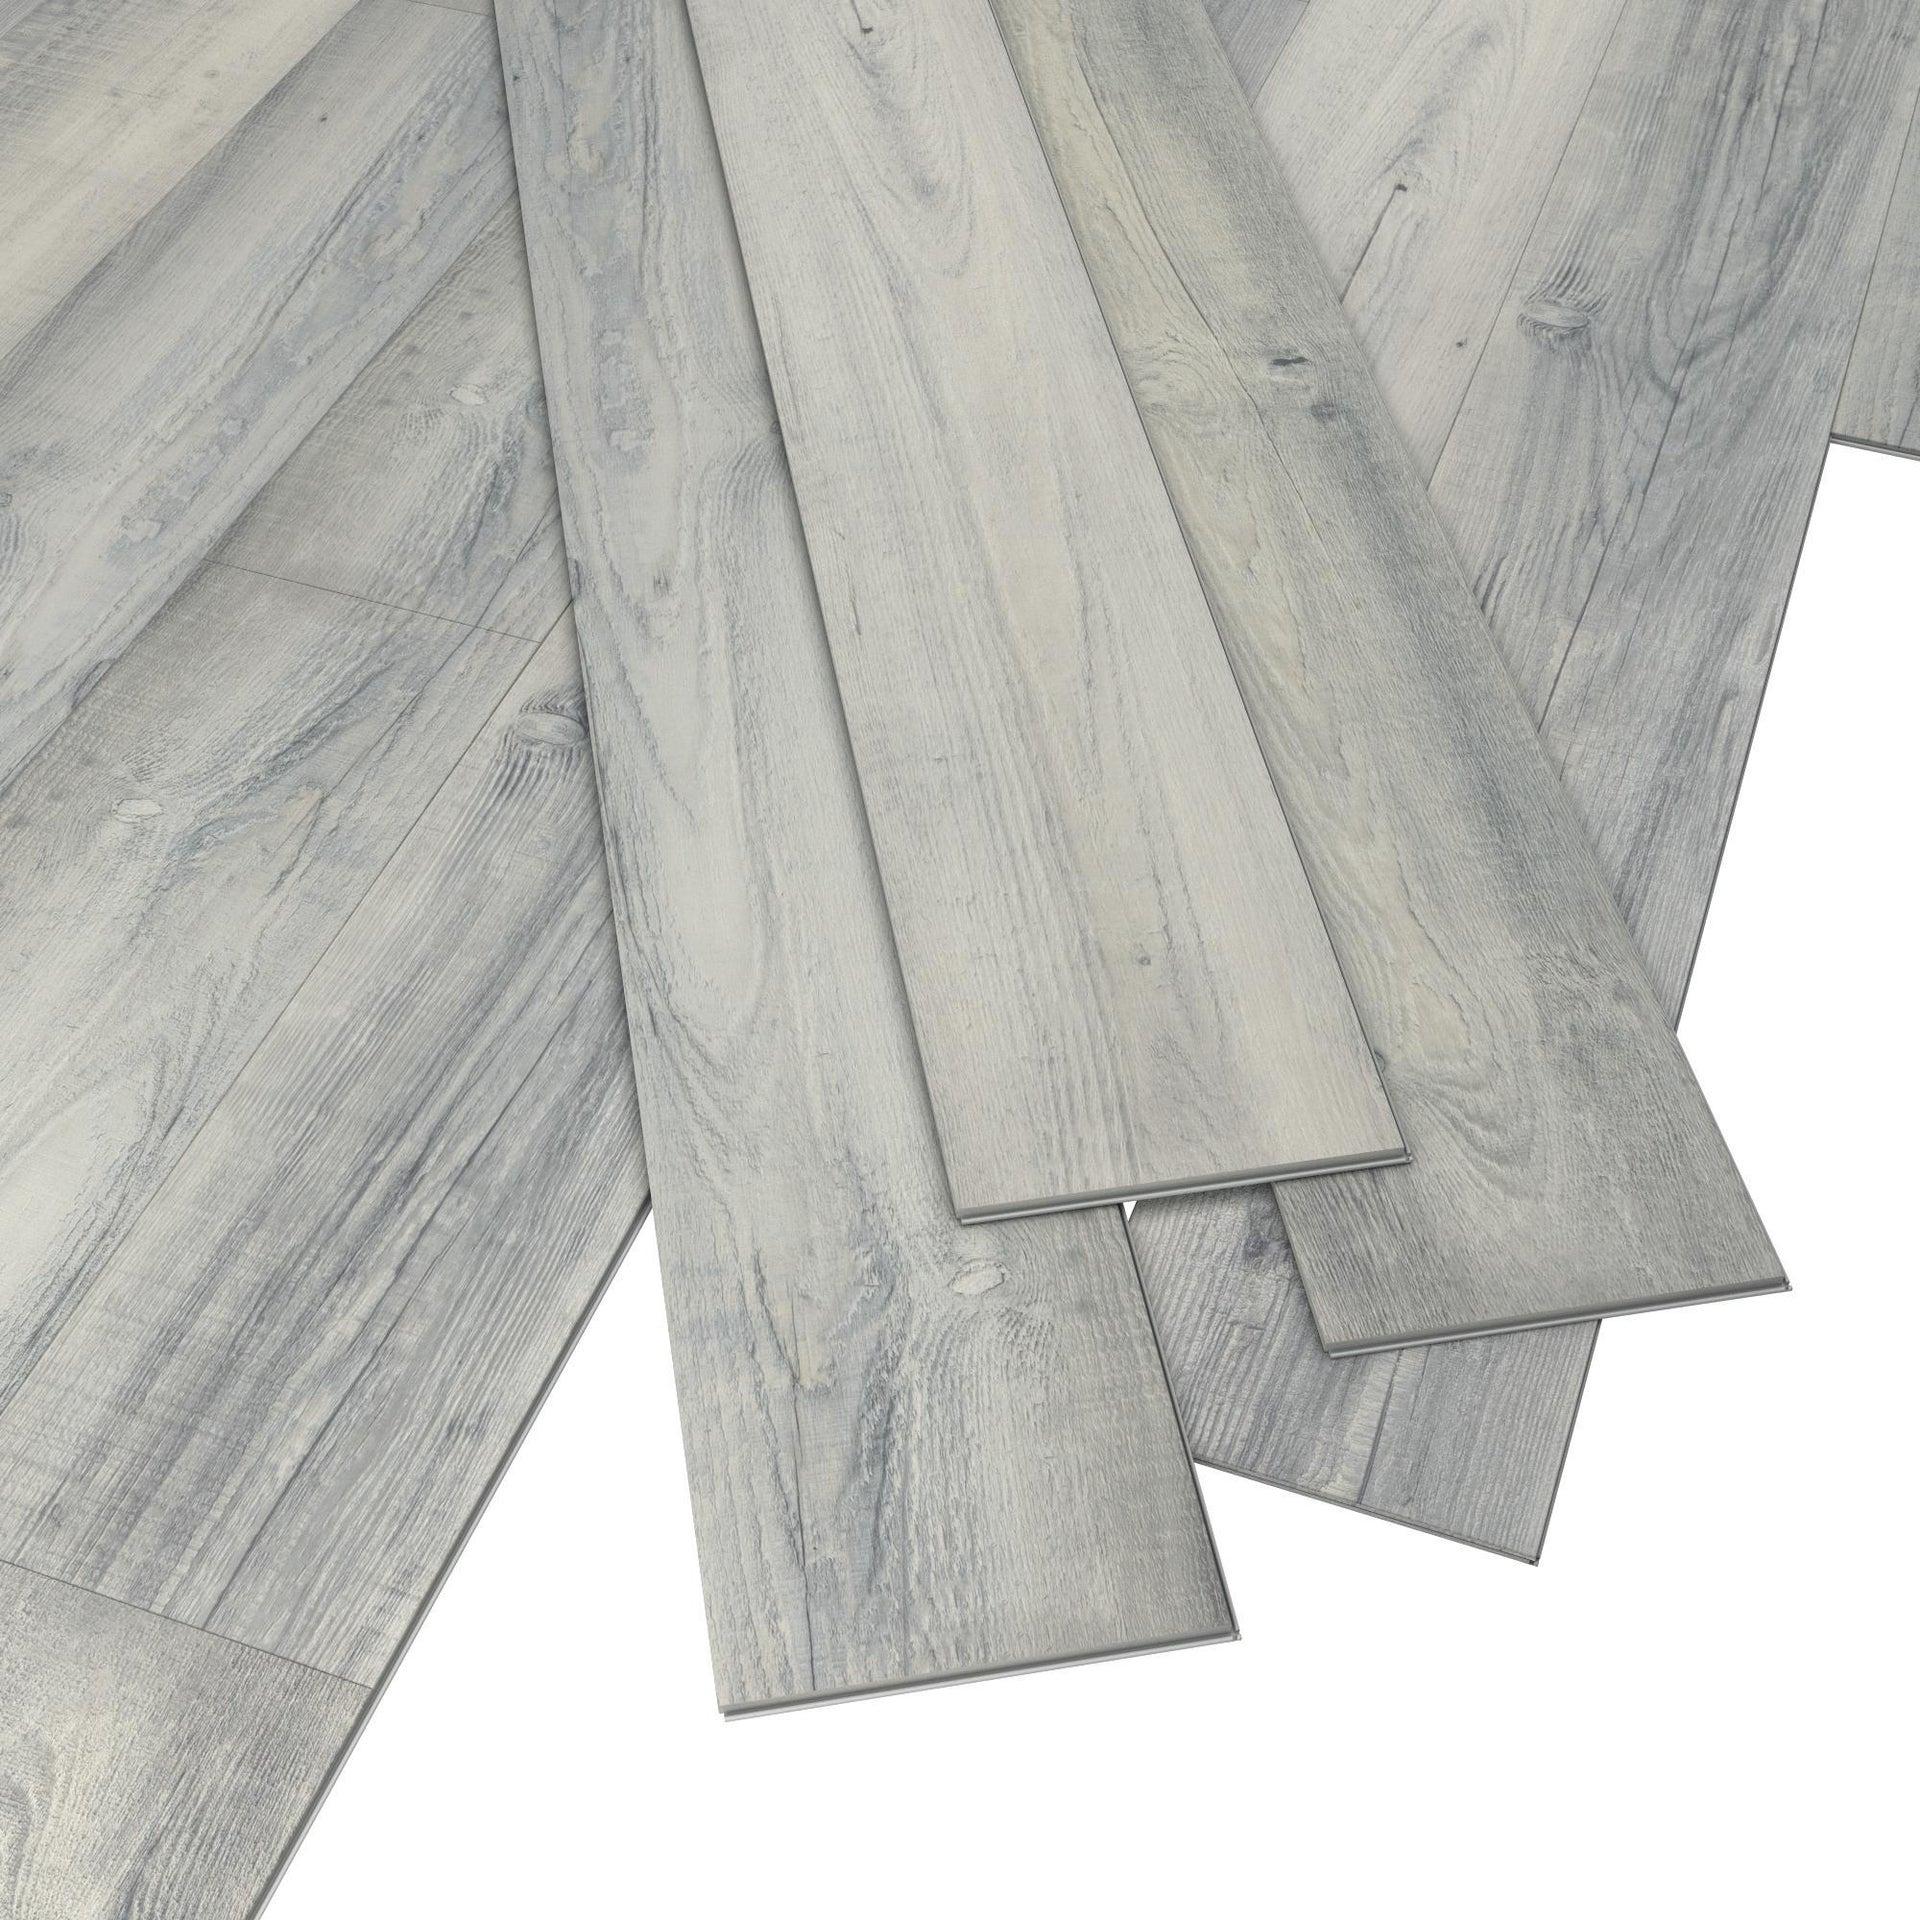 Plancia di vinile flottante clic+ Solor Sp 5 mm grigio / argento - 4